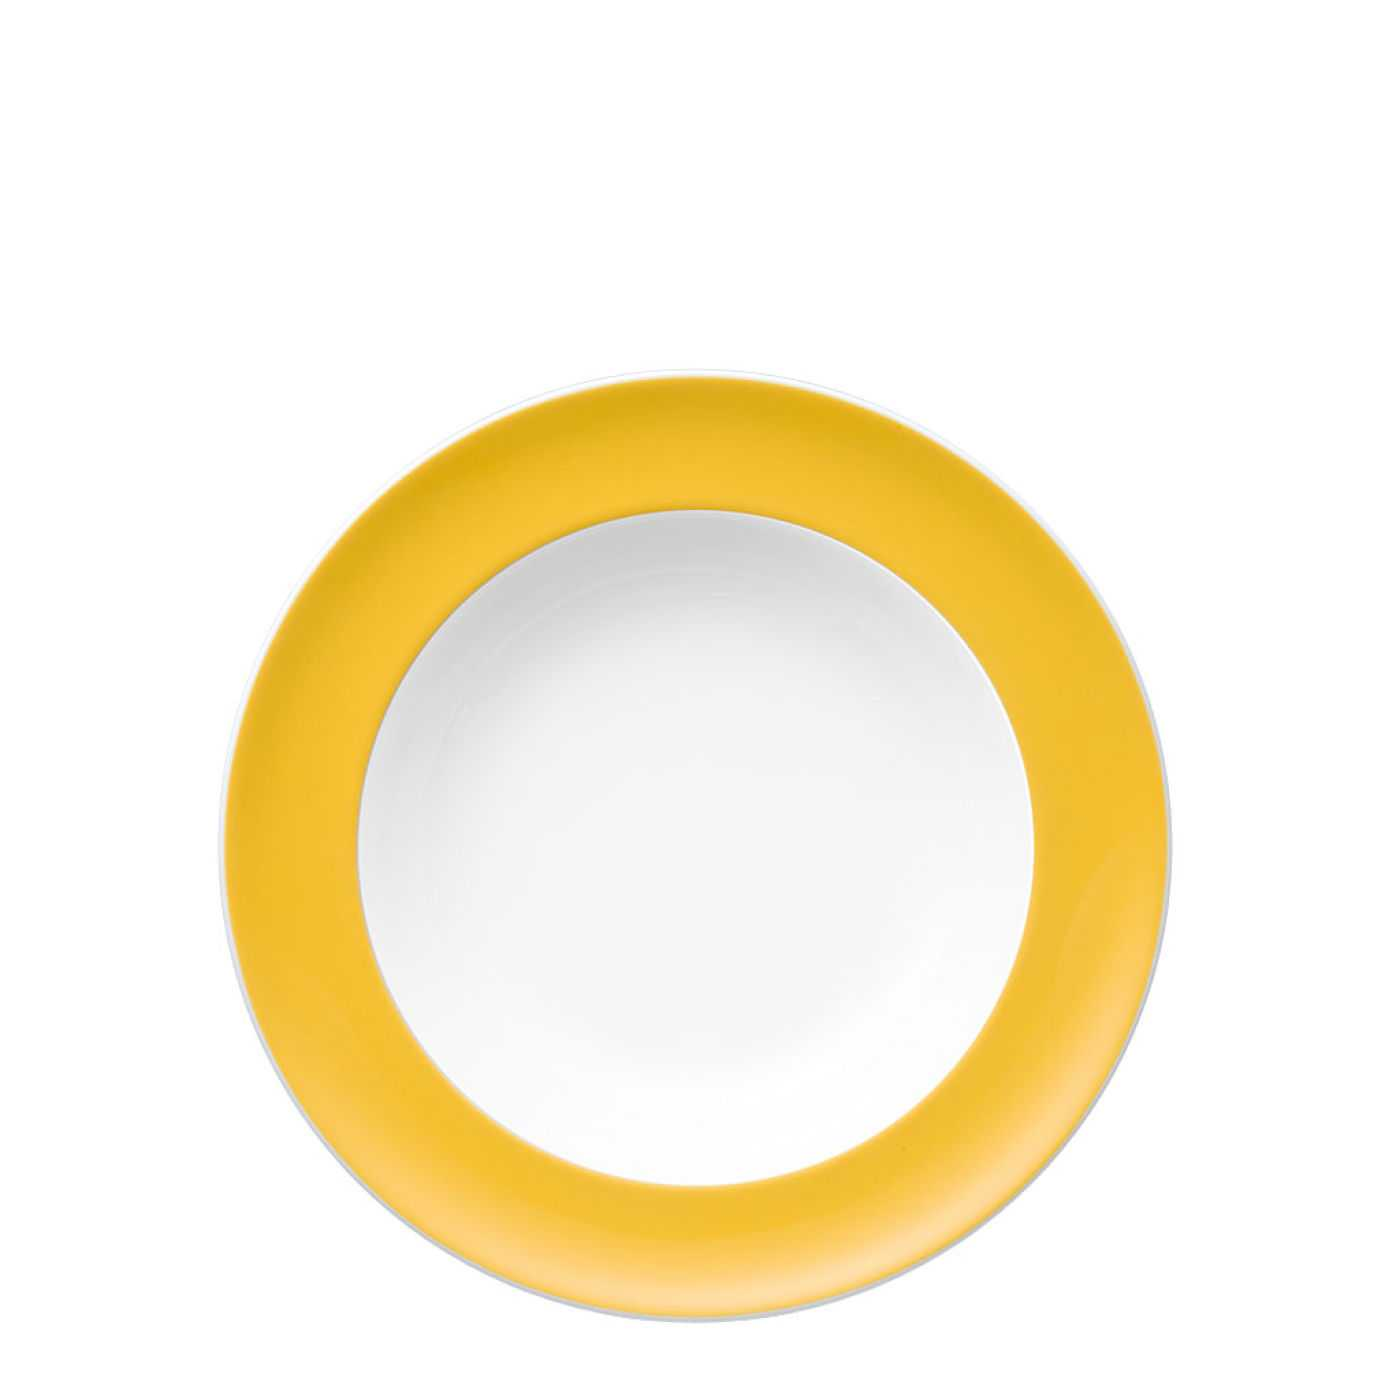 Онлайн каталог PROMENU: Тарелка глубокая Rosenthal SUNNY DAY, диаметр 23 см, желтый Rosenthal 70850-408502-10323